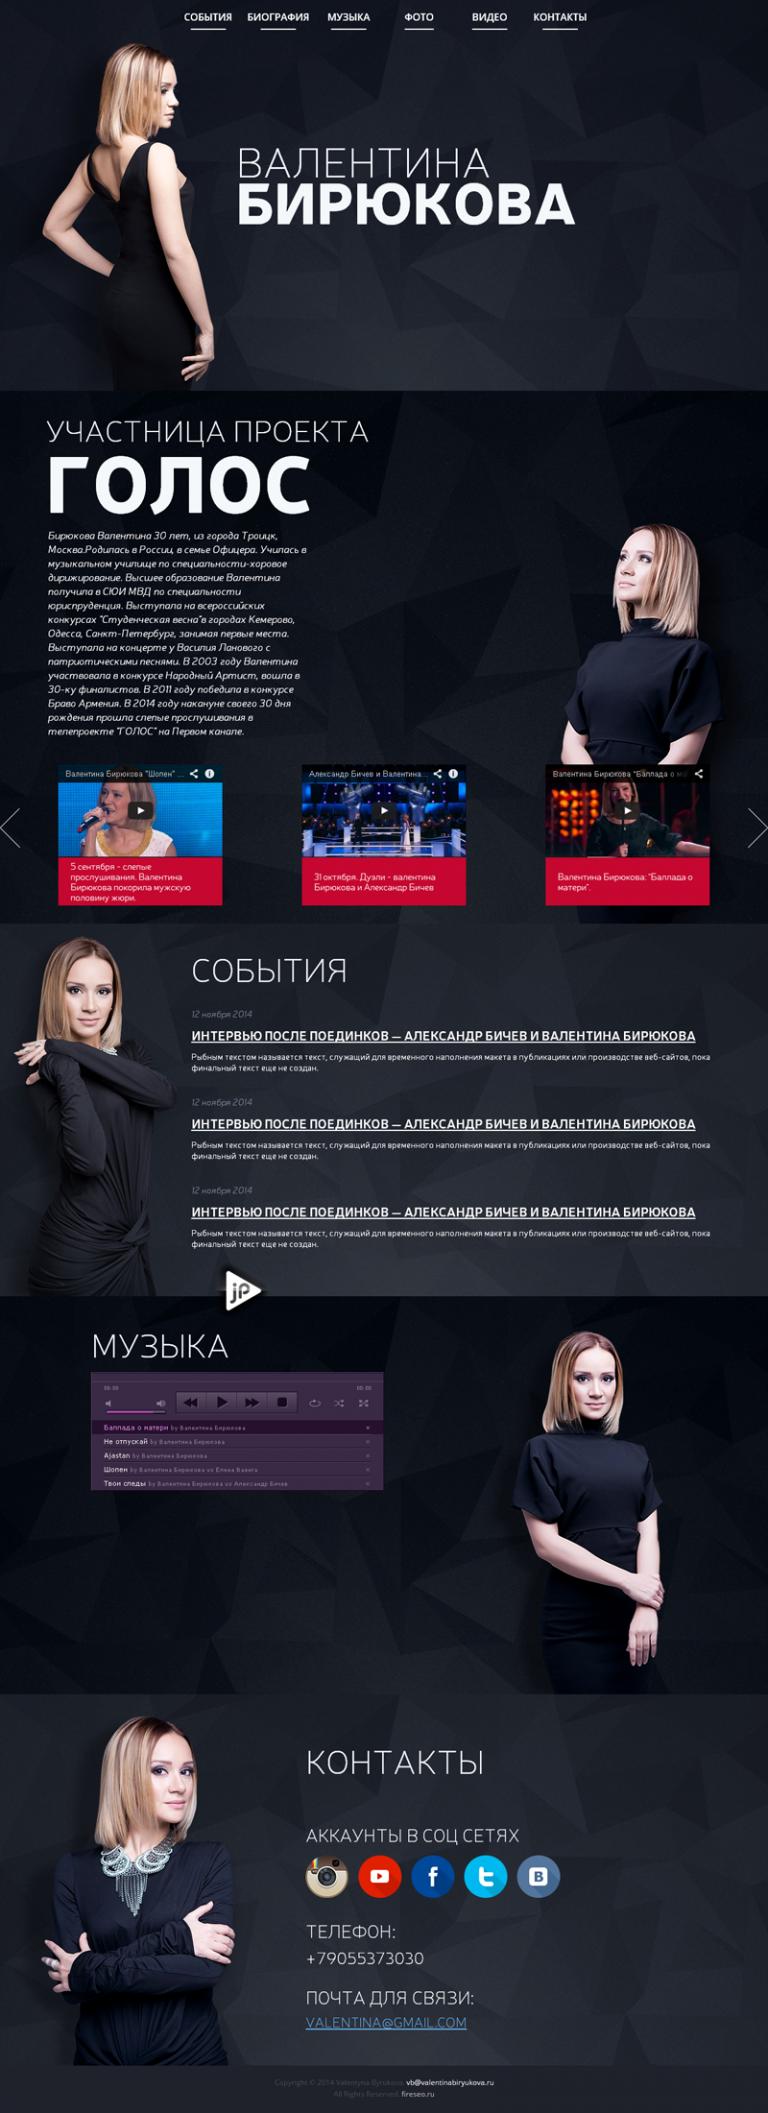 valentinabiryukova.ru